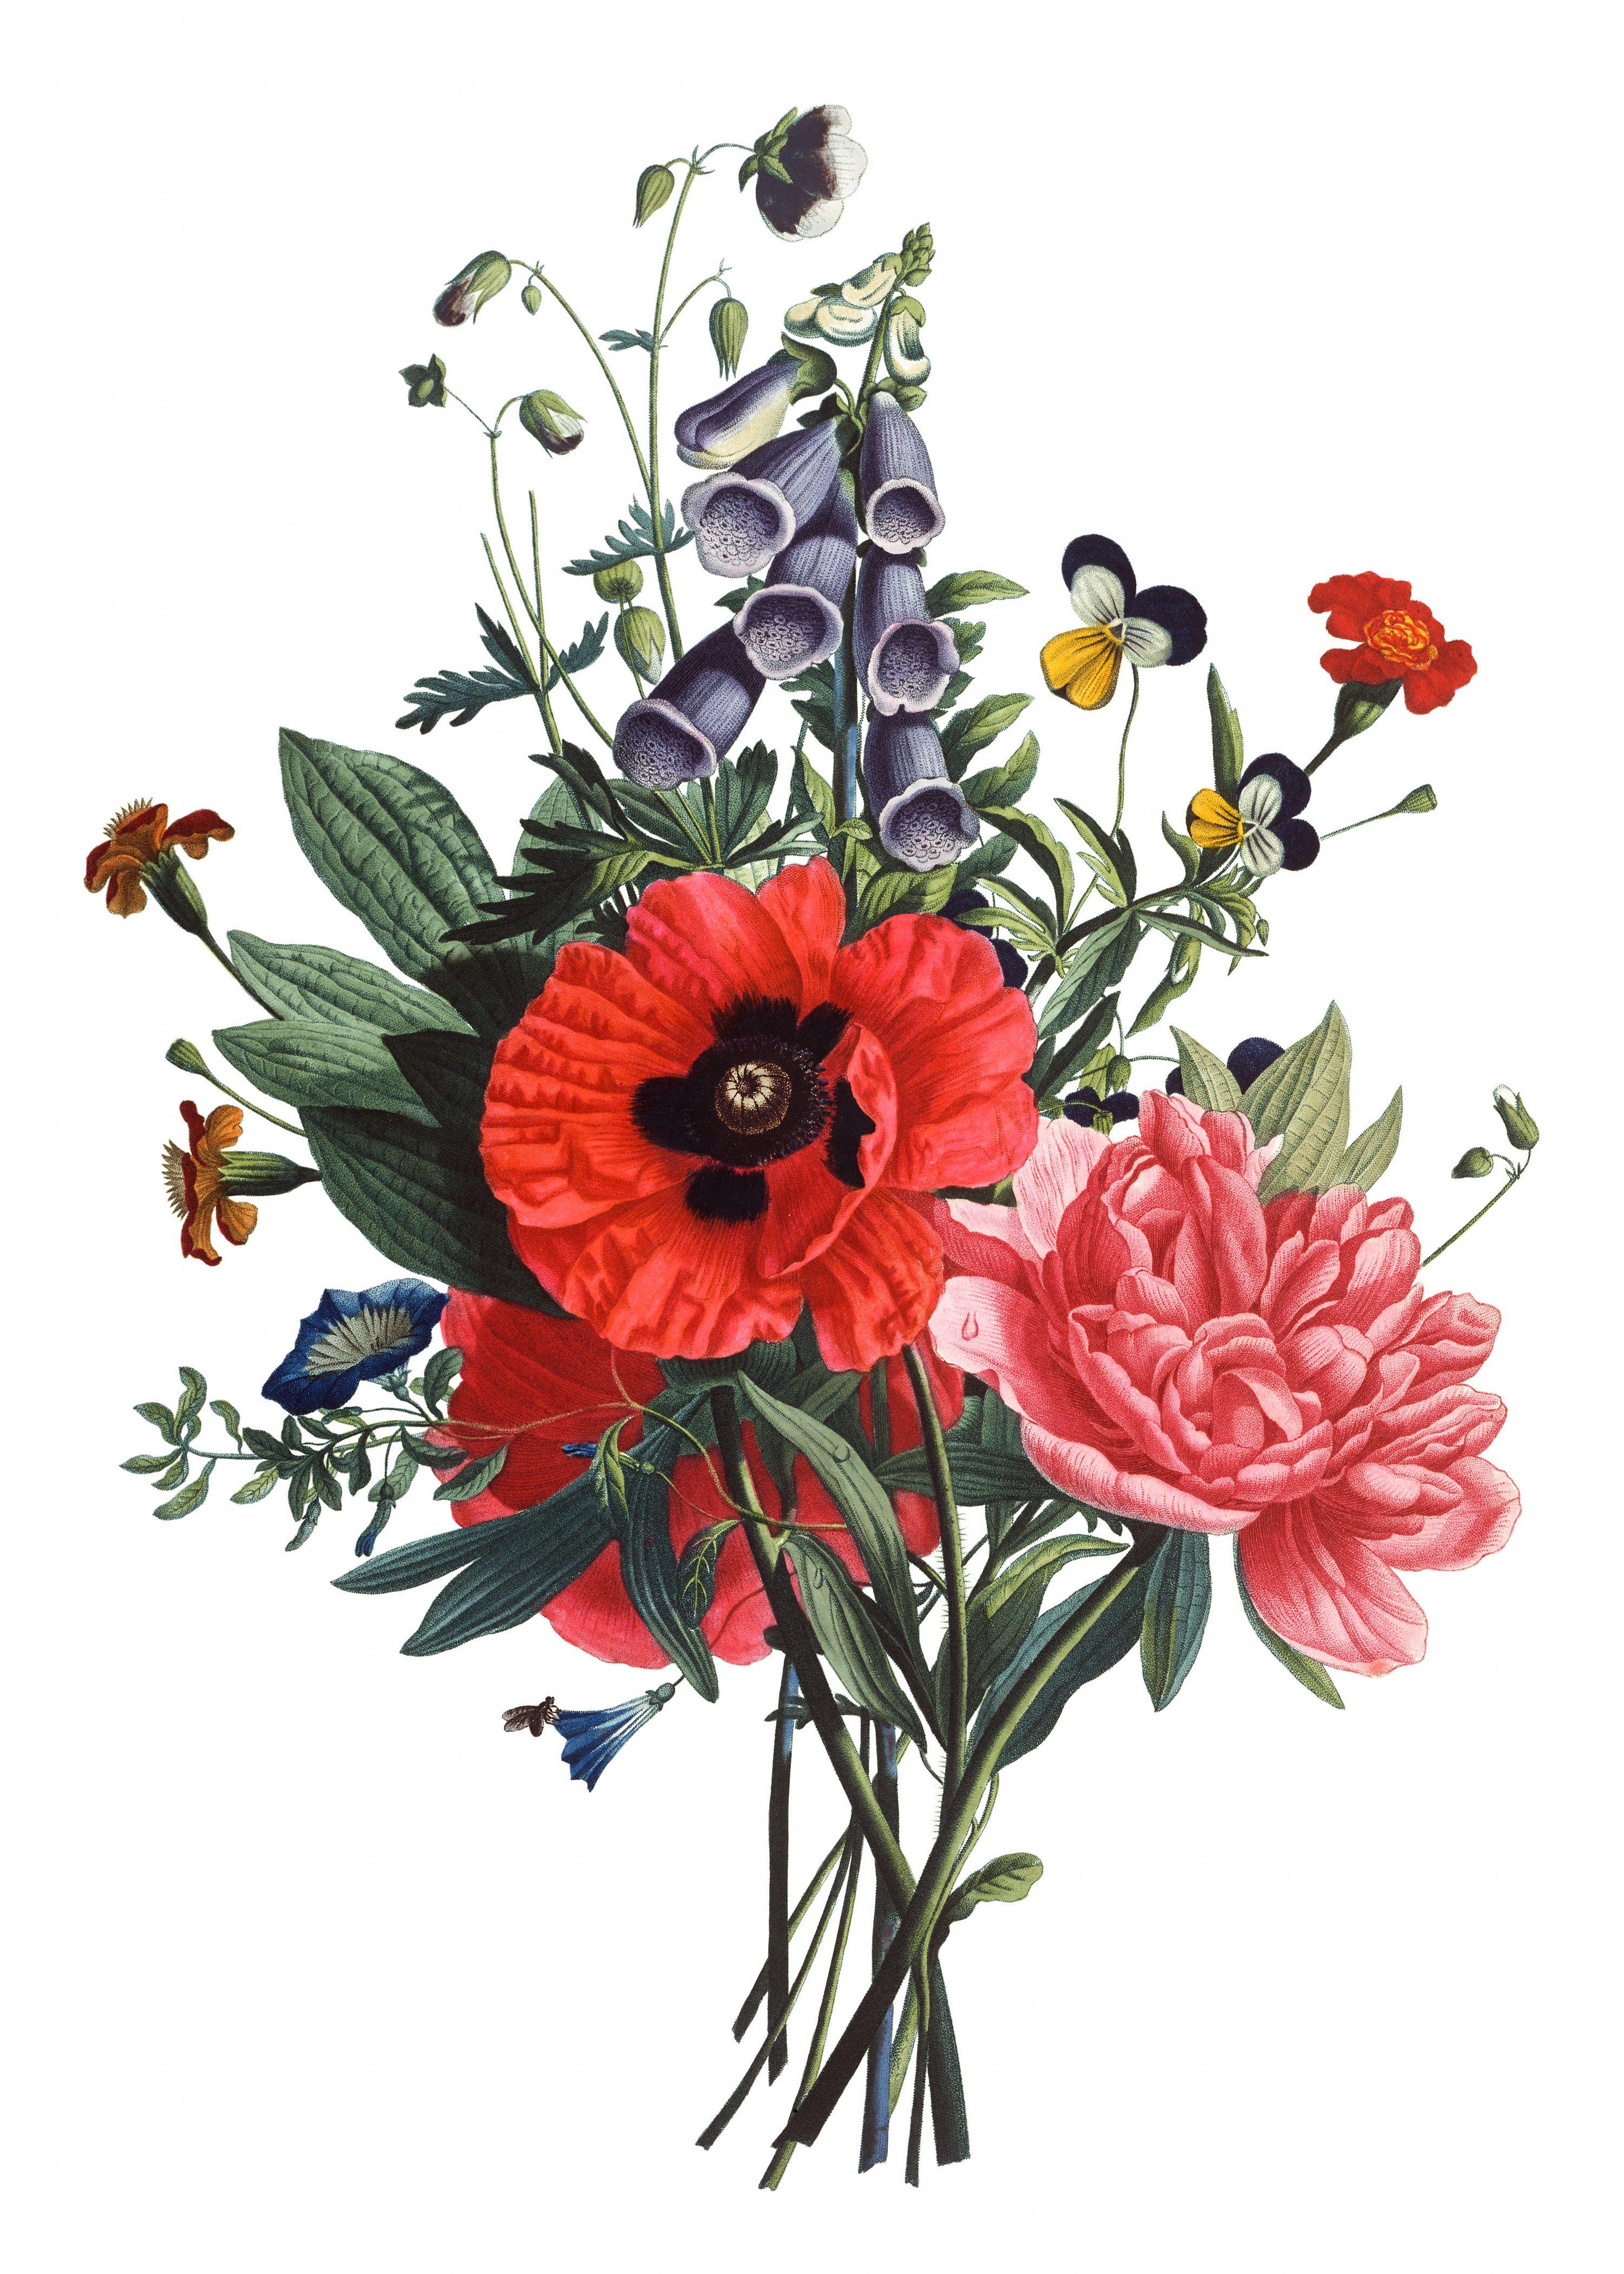 Pin By Iren Potyondi On Floresflowersvirgok Pinterest Tattoos